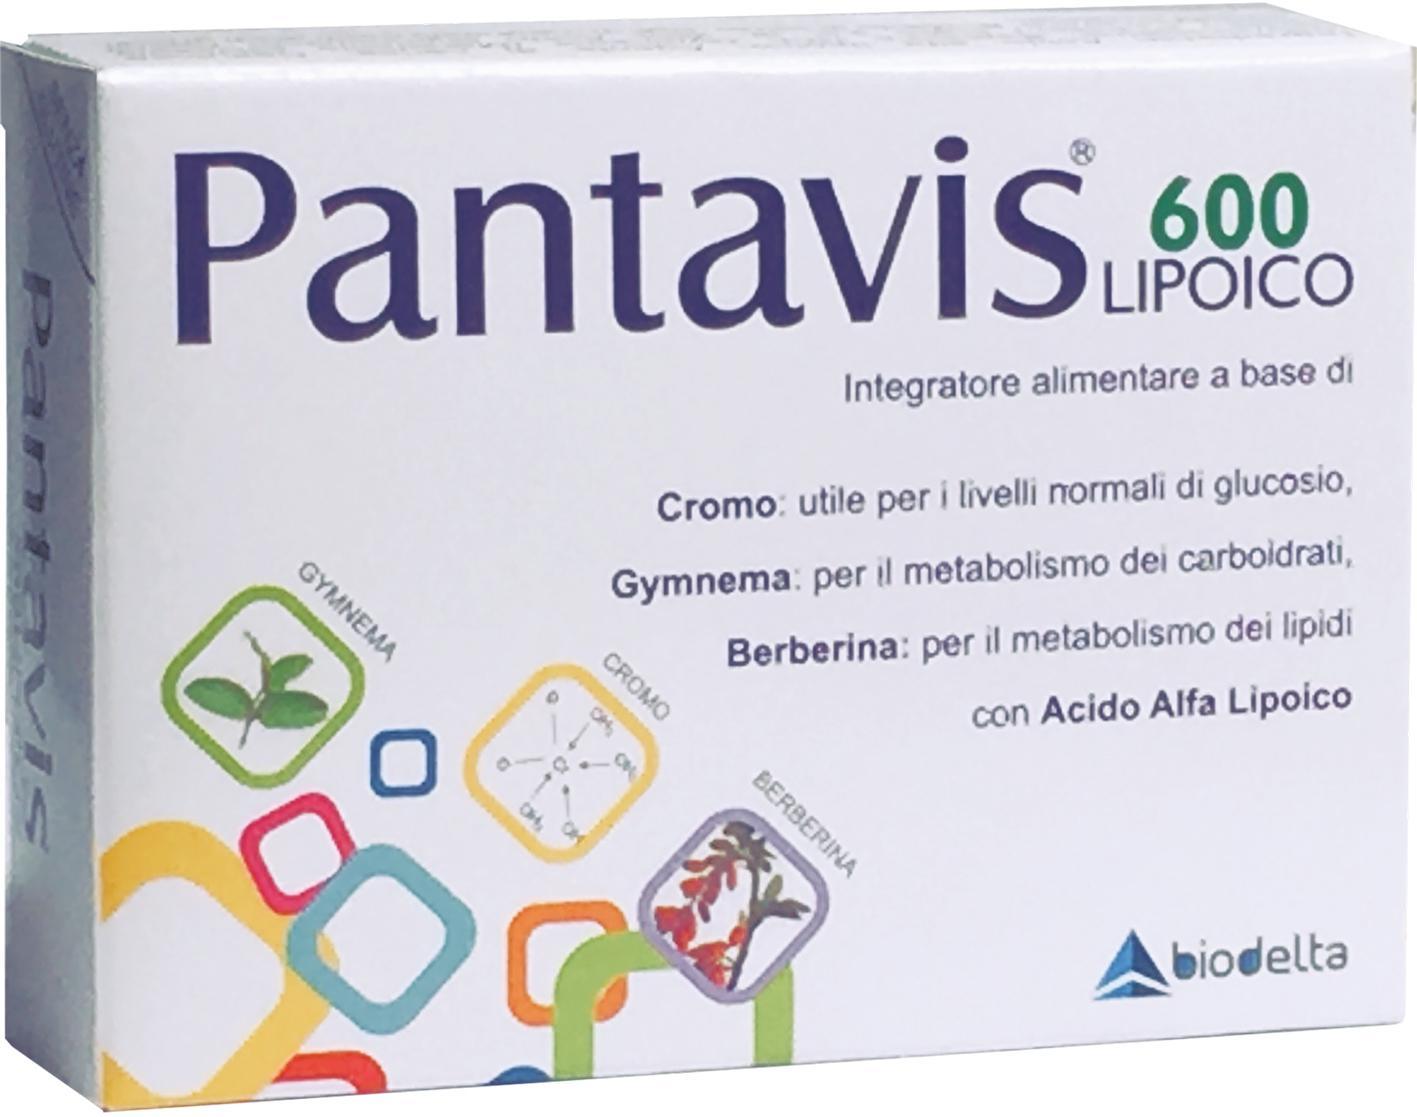 PANTAVIS® 600 lipoico